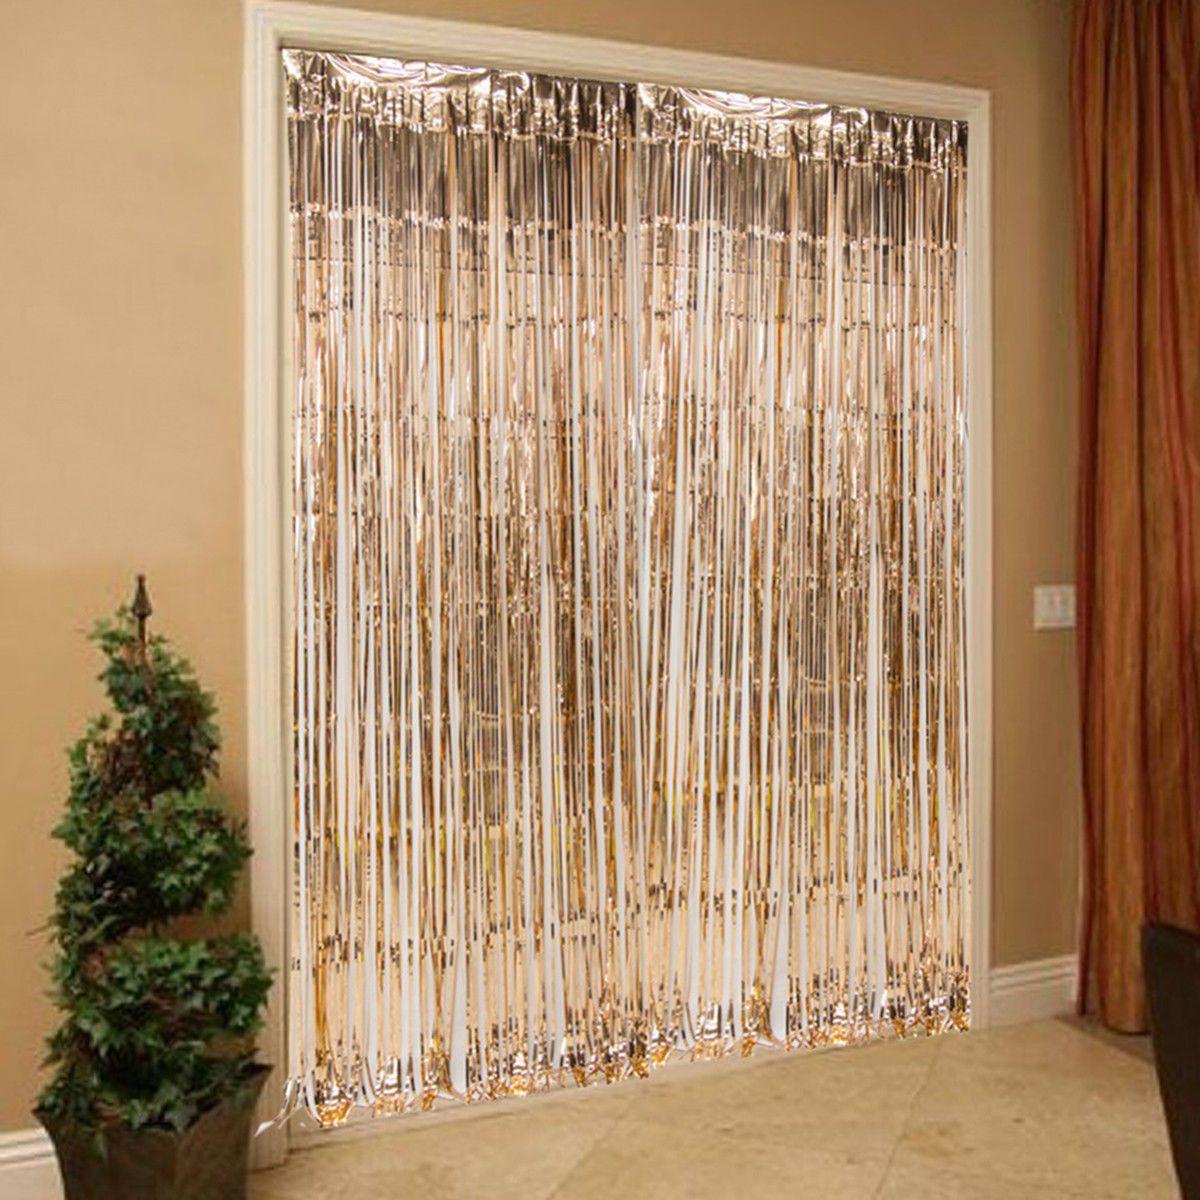 5 39 Gbp Rose Gold Foil Fringe Curtain 245cm Party Wedding